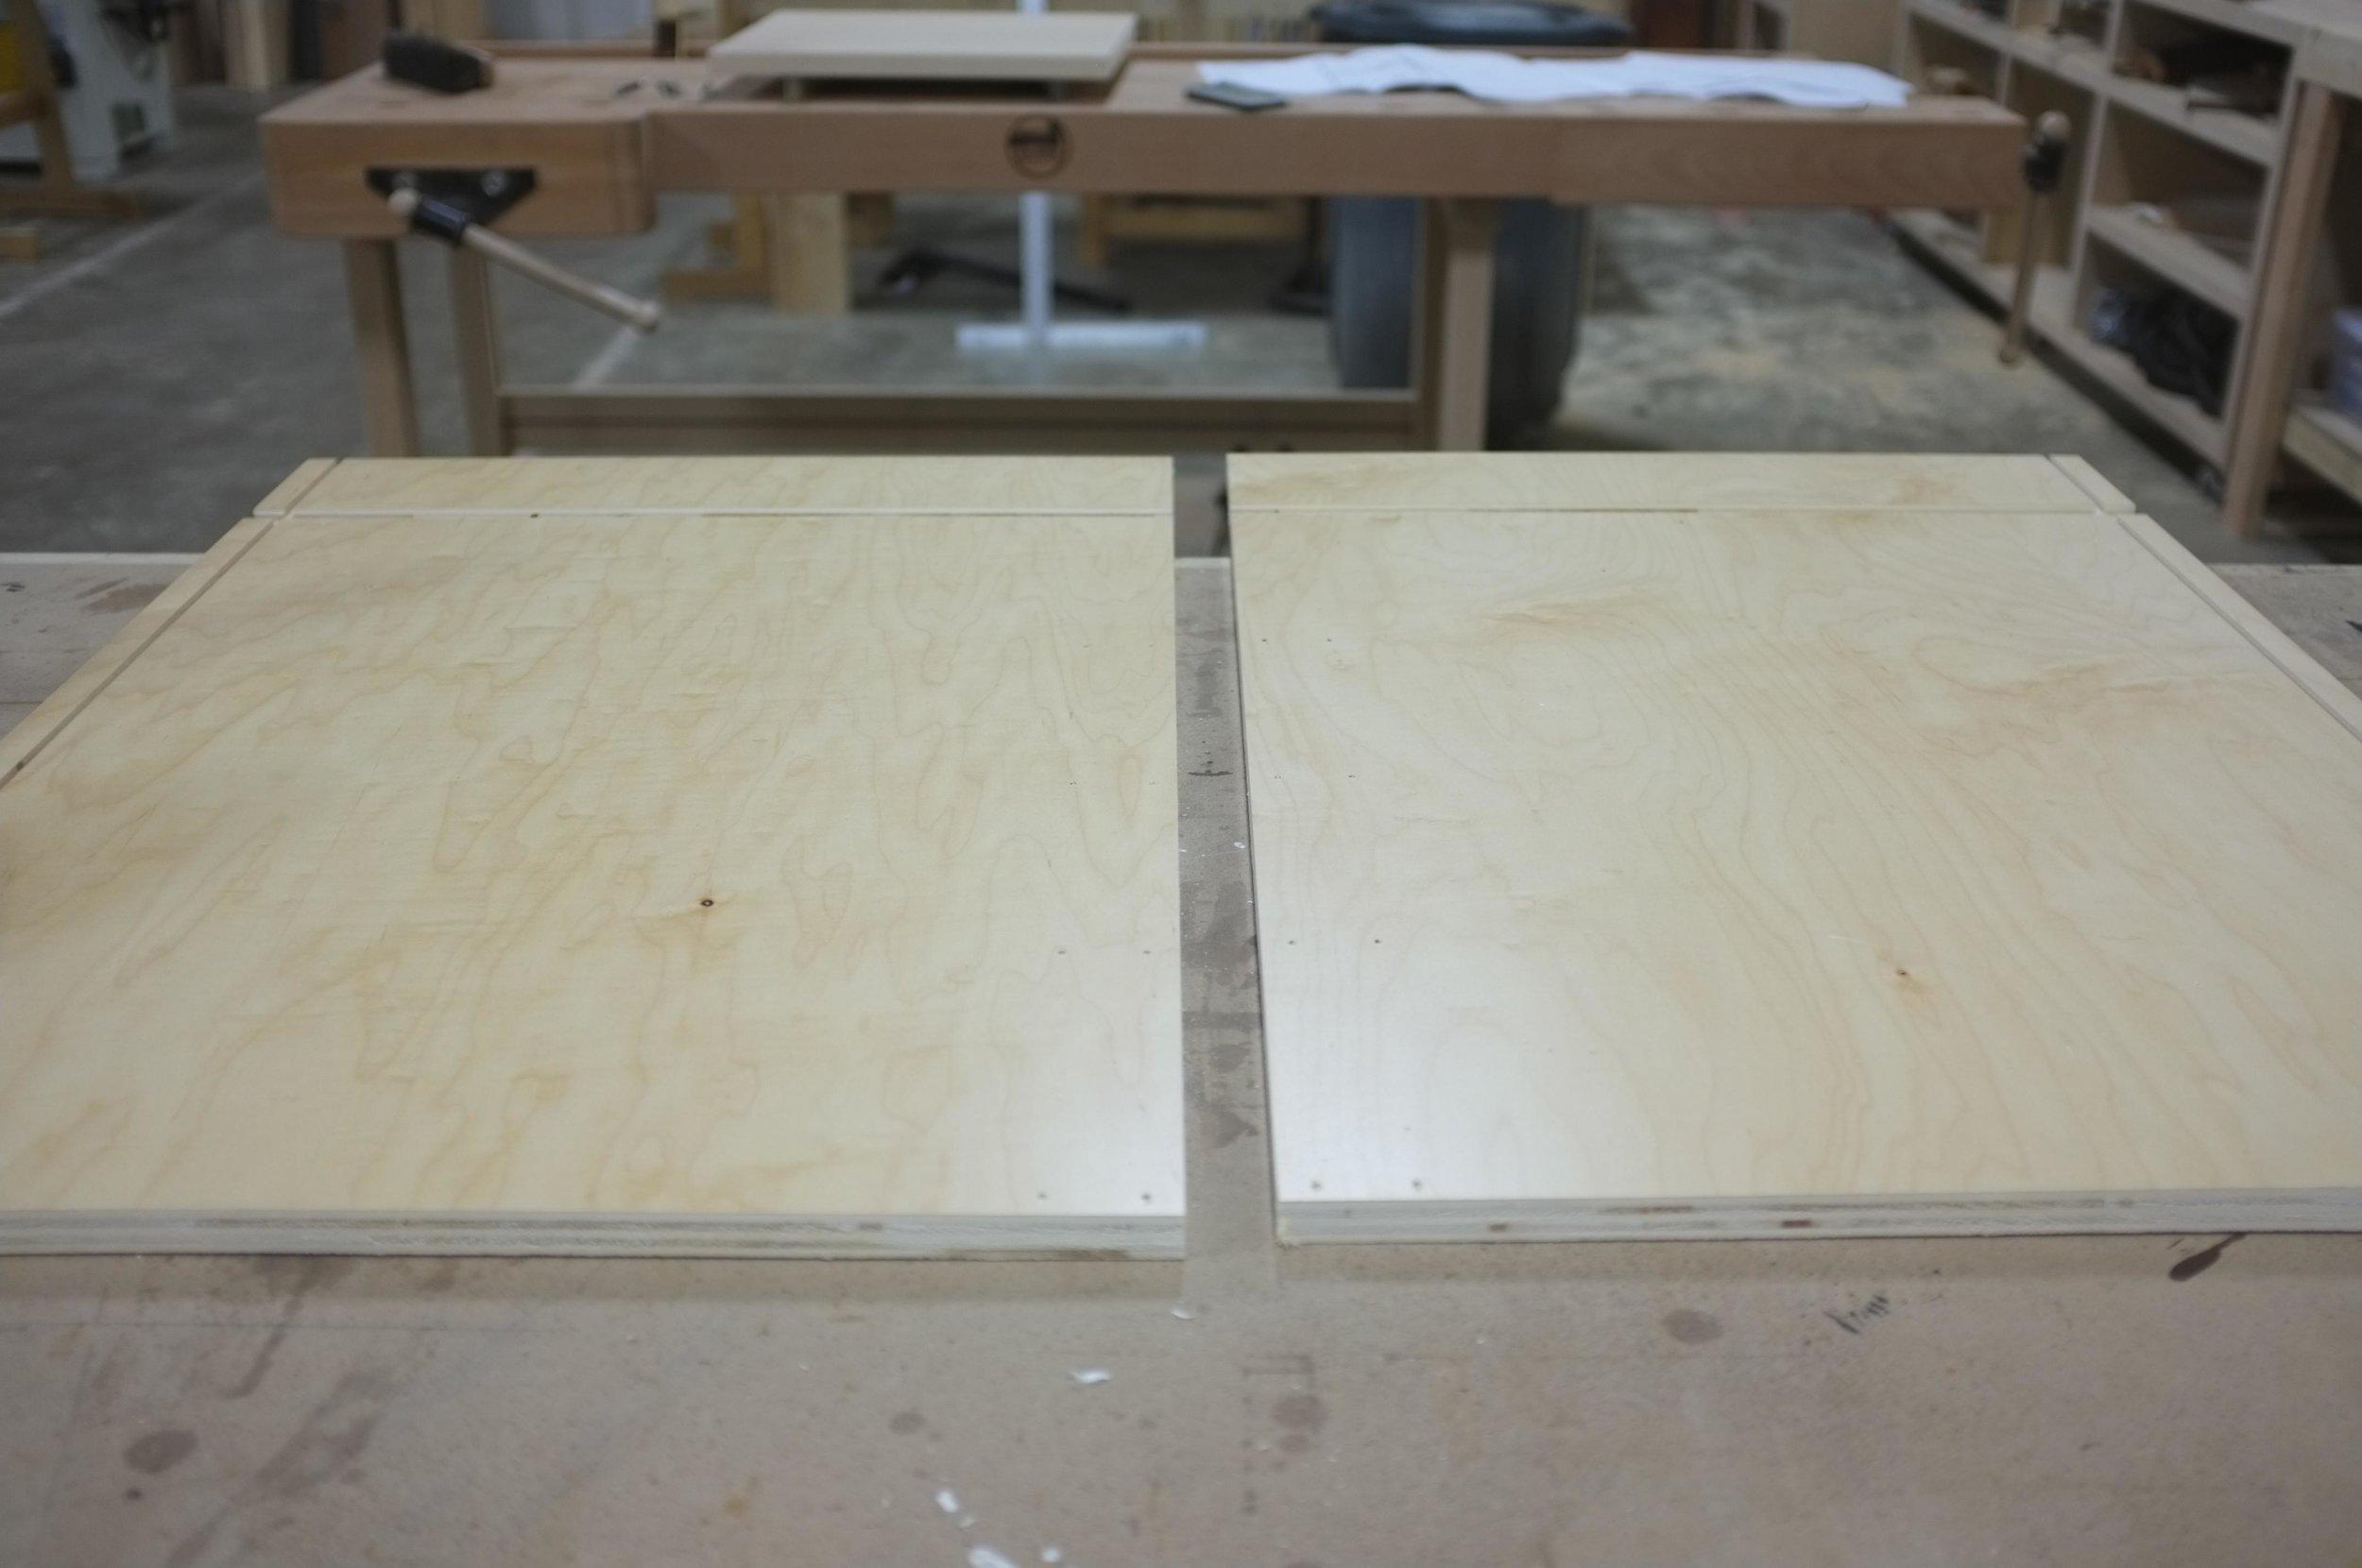 Sheetgood Fabrication and Assembly